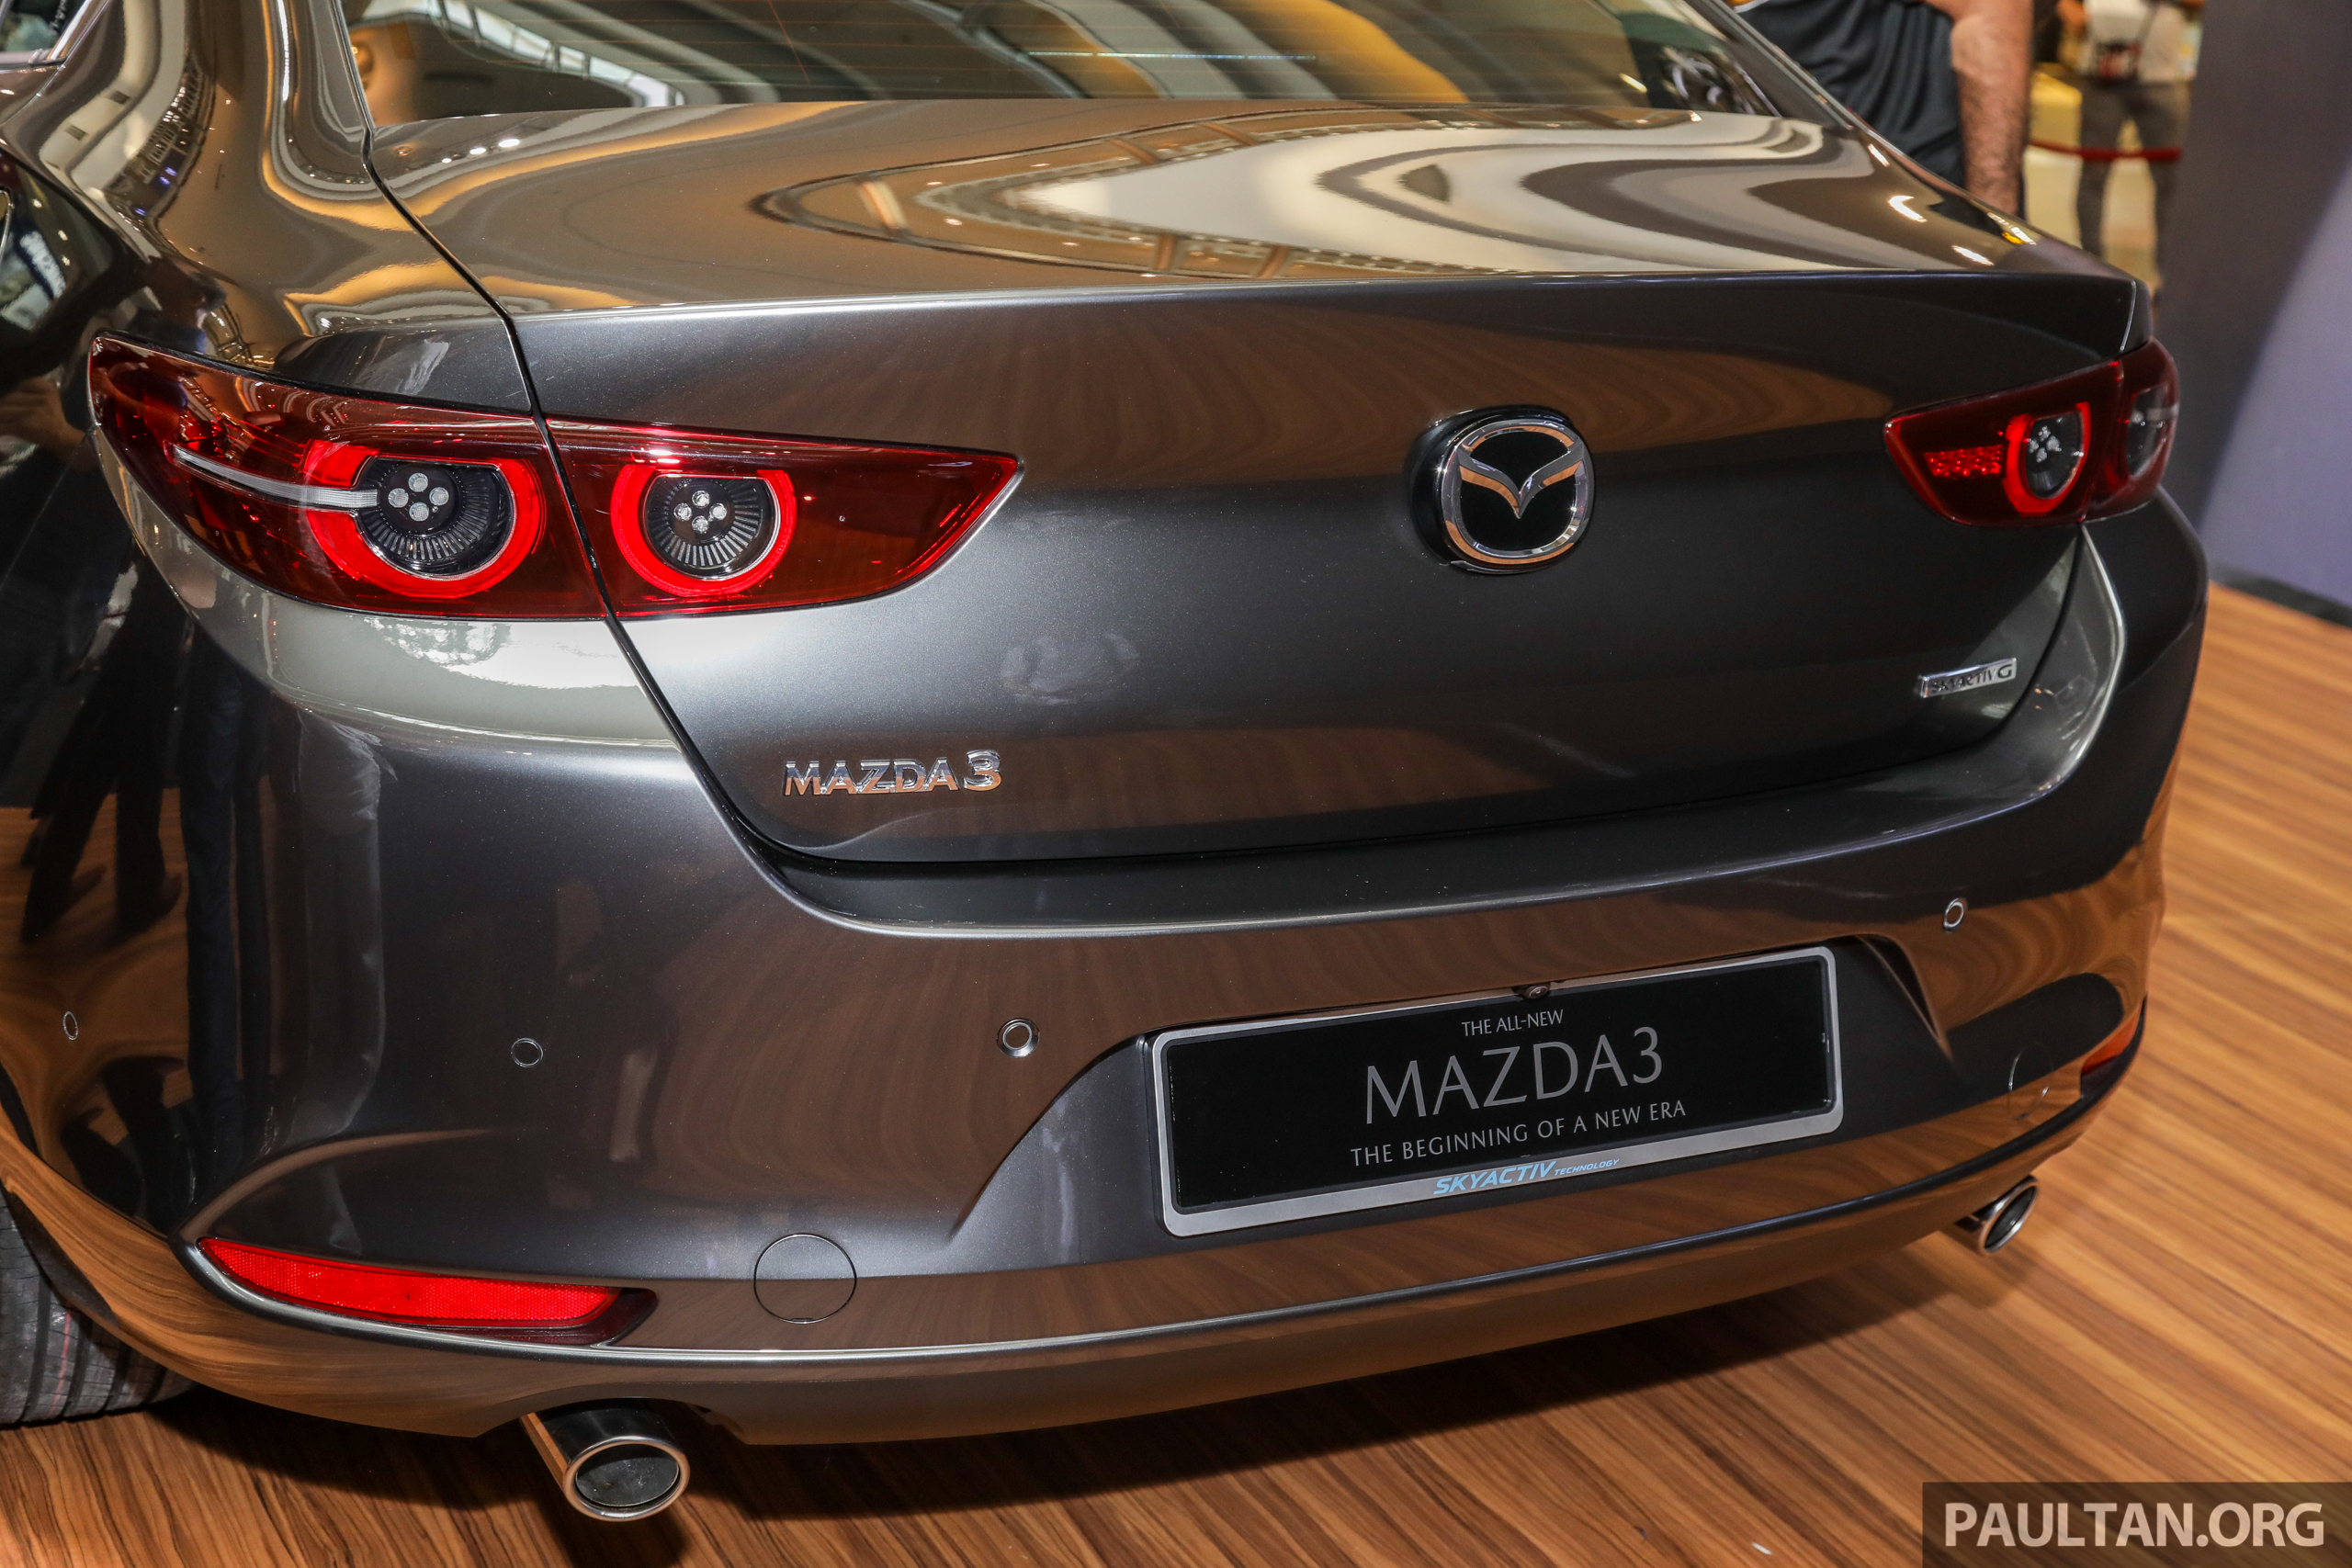 Kelebihan Harga Mazda 3 2019 Tangguh